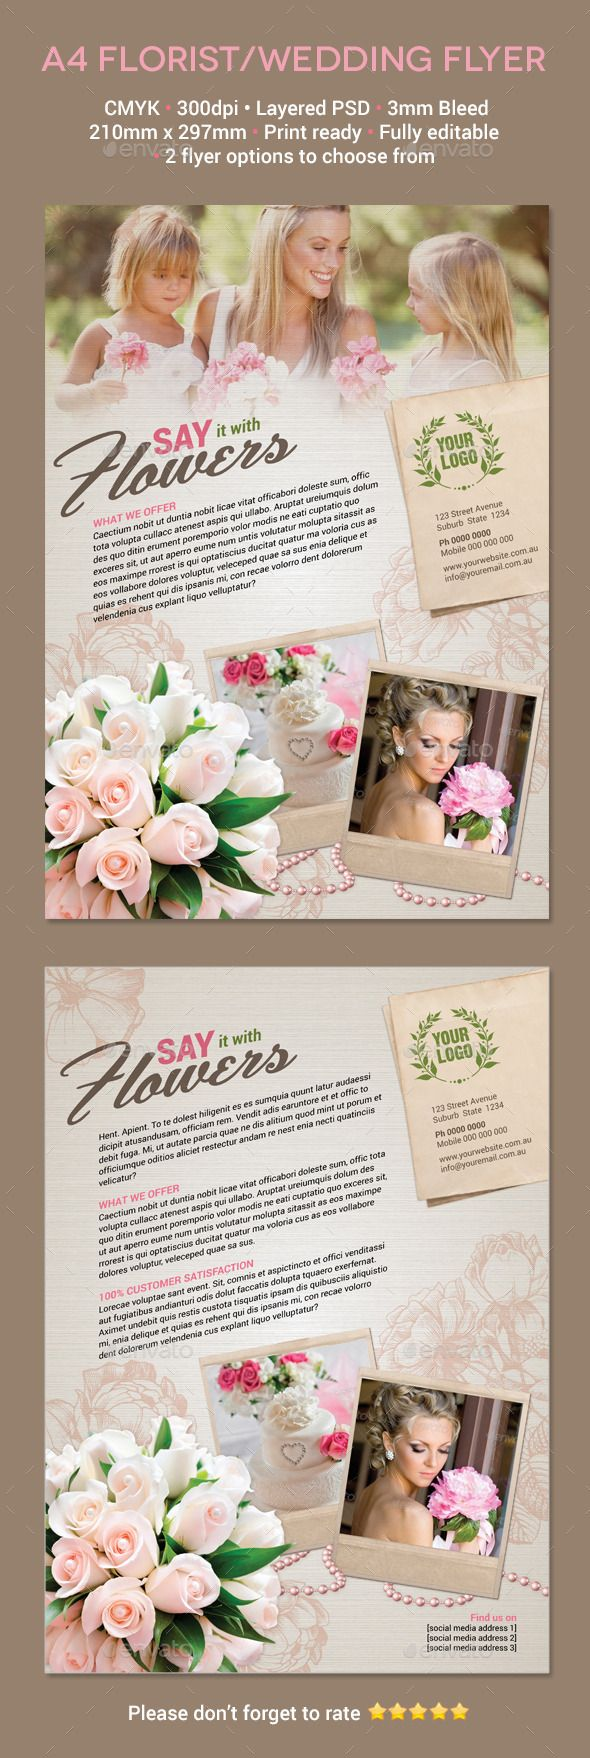 Florist / Wedding A4 Flyer Template Psd | Buy And Download:  Http://graphicriver.net/item/florist-Wedding-A4-Flyer/8832646?